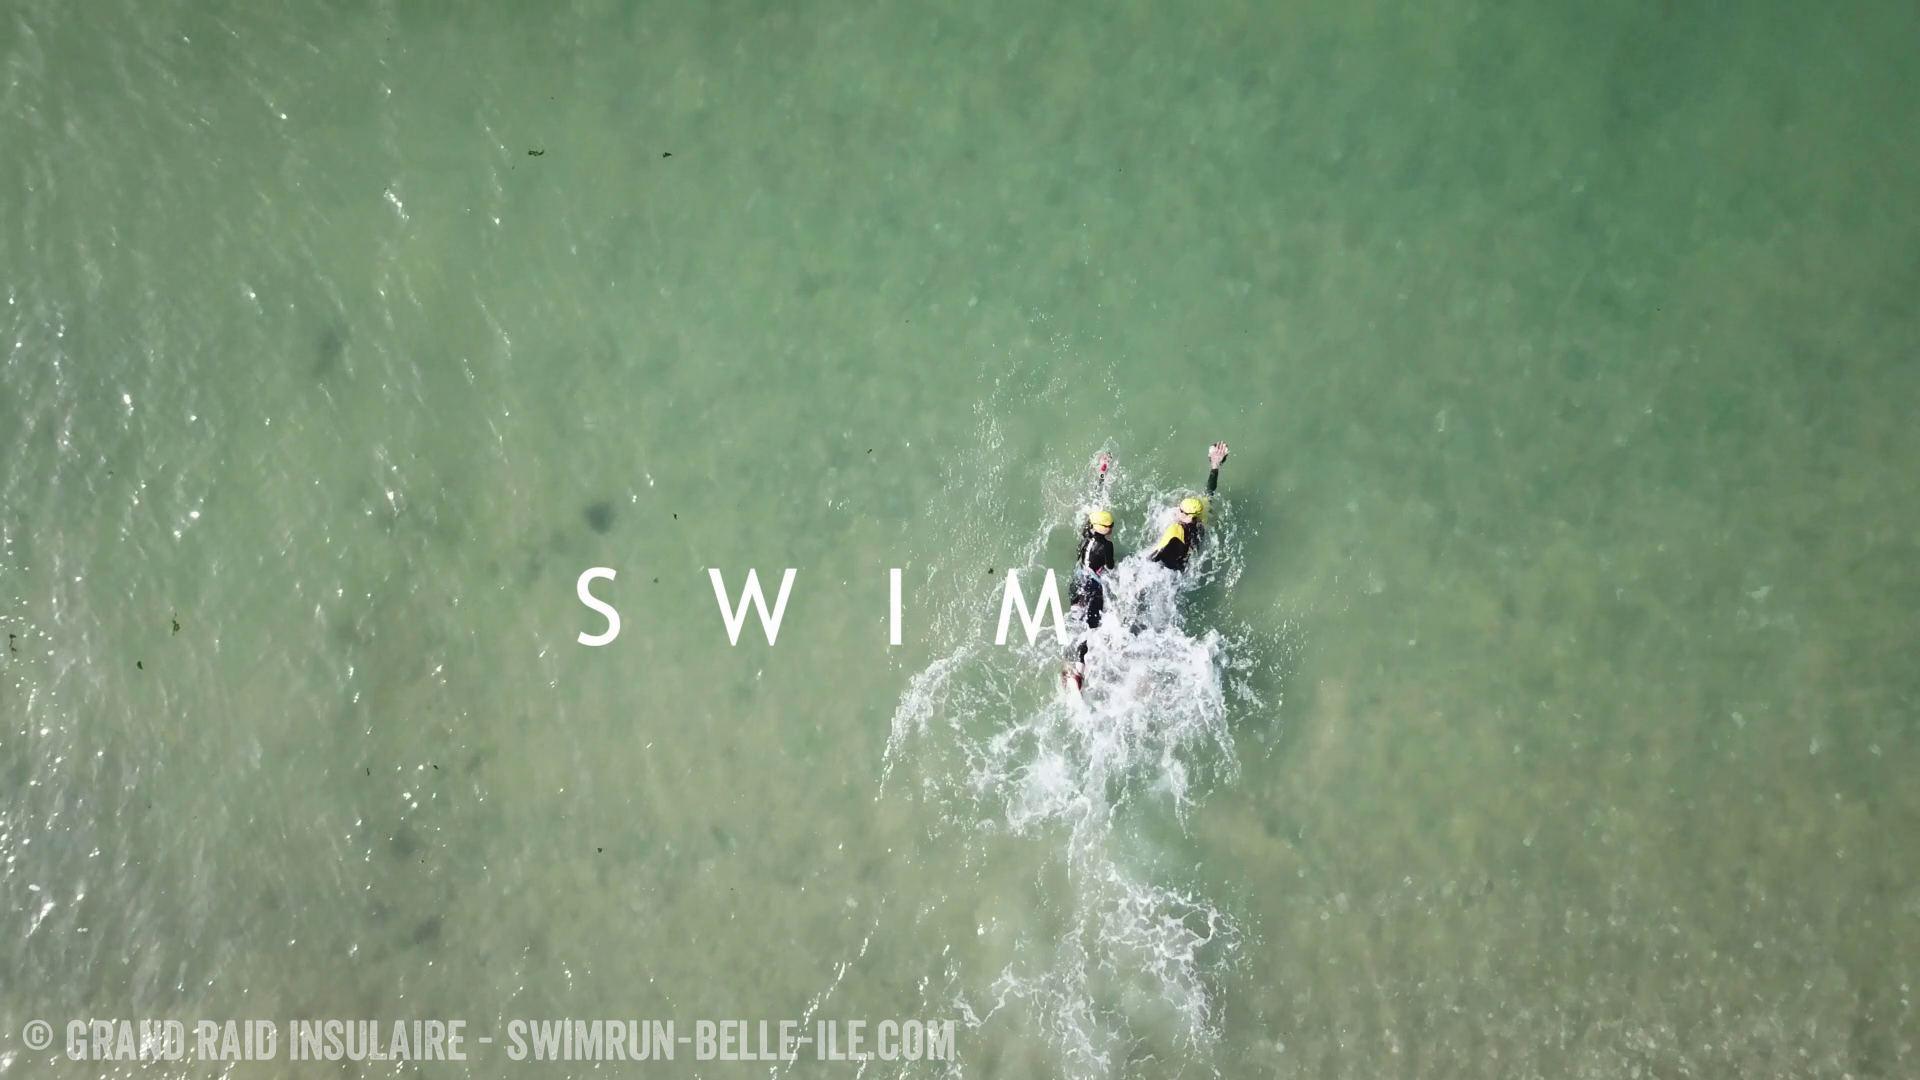 swimrun-hd_teaser_cr_resize_11